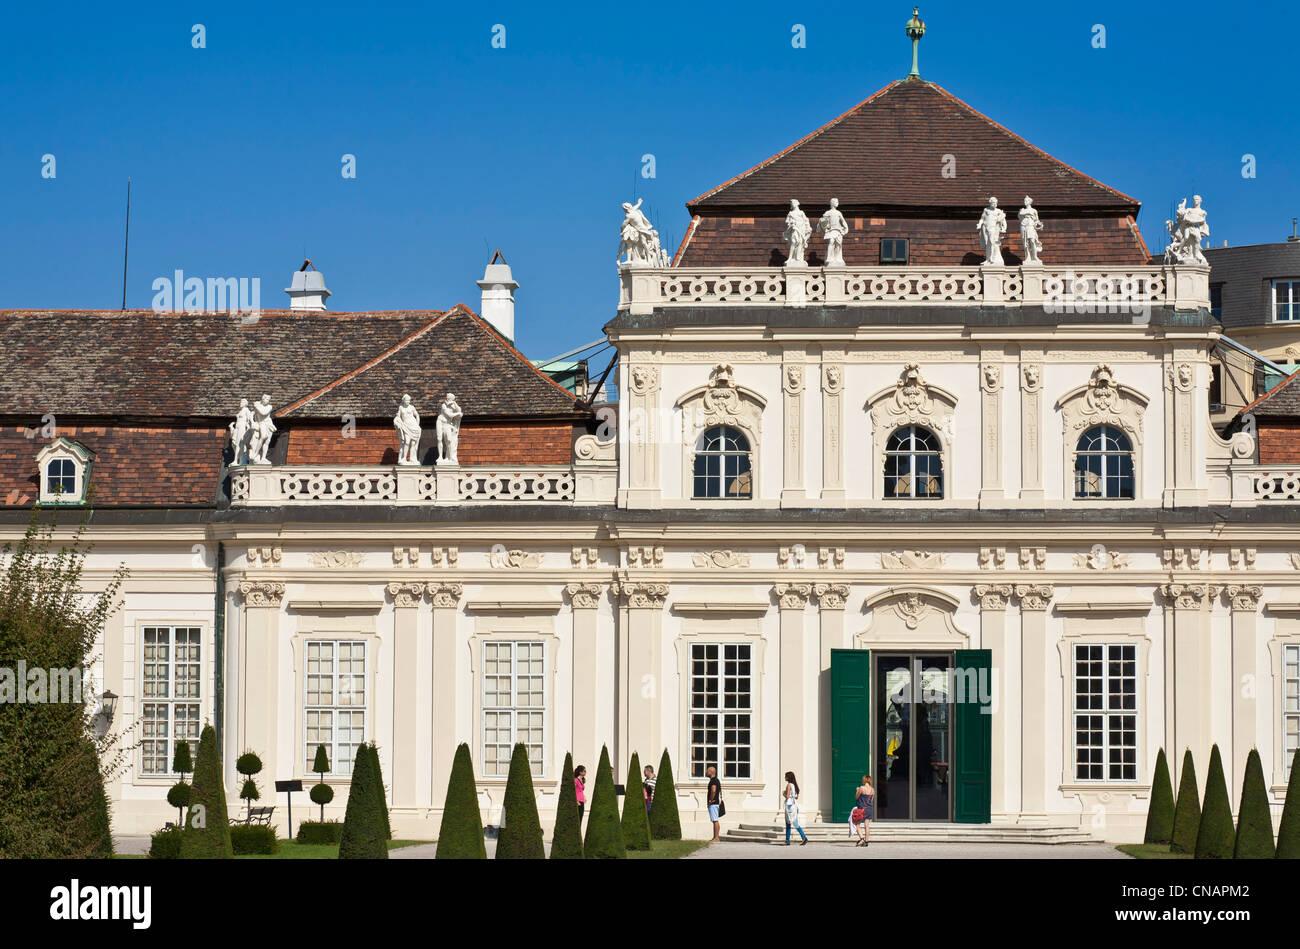 Austria, Vienna, Belvedere Palace, Baroque style, built by Johann Lukas von Hildebrandt in the early 18th century, - Stock Image